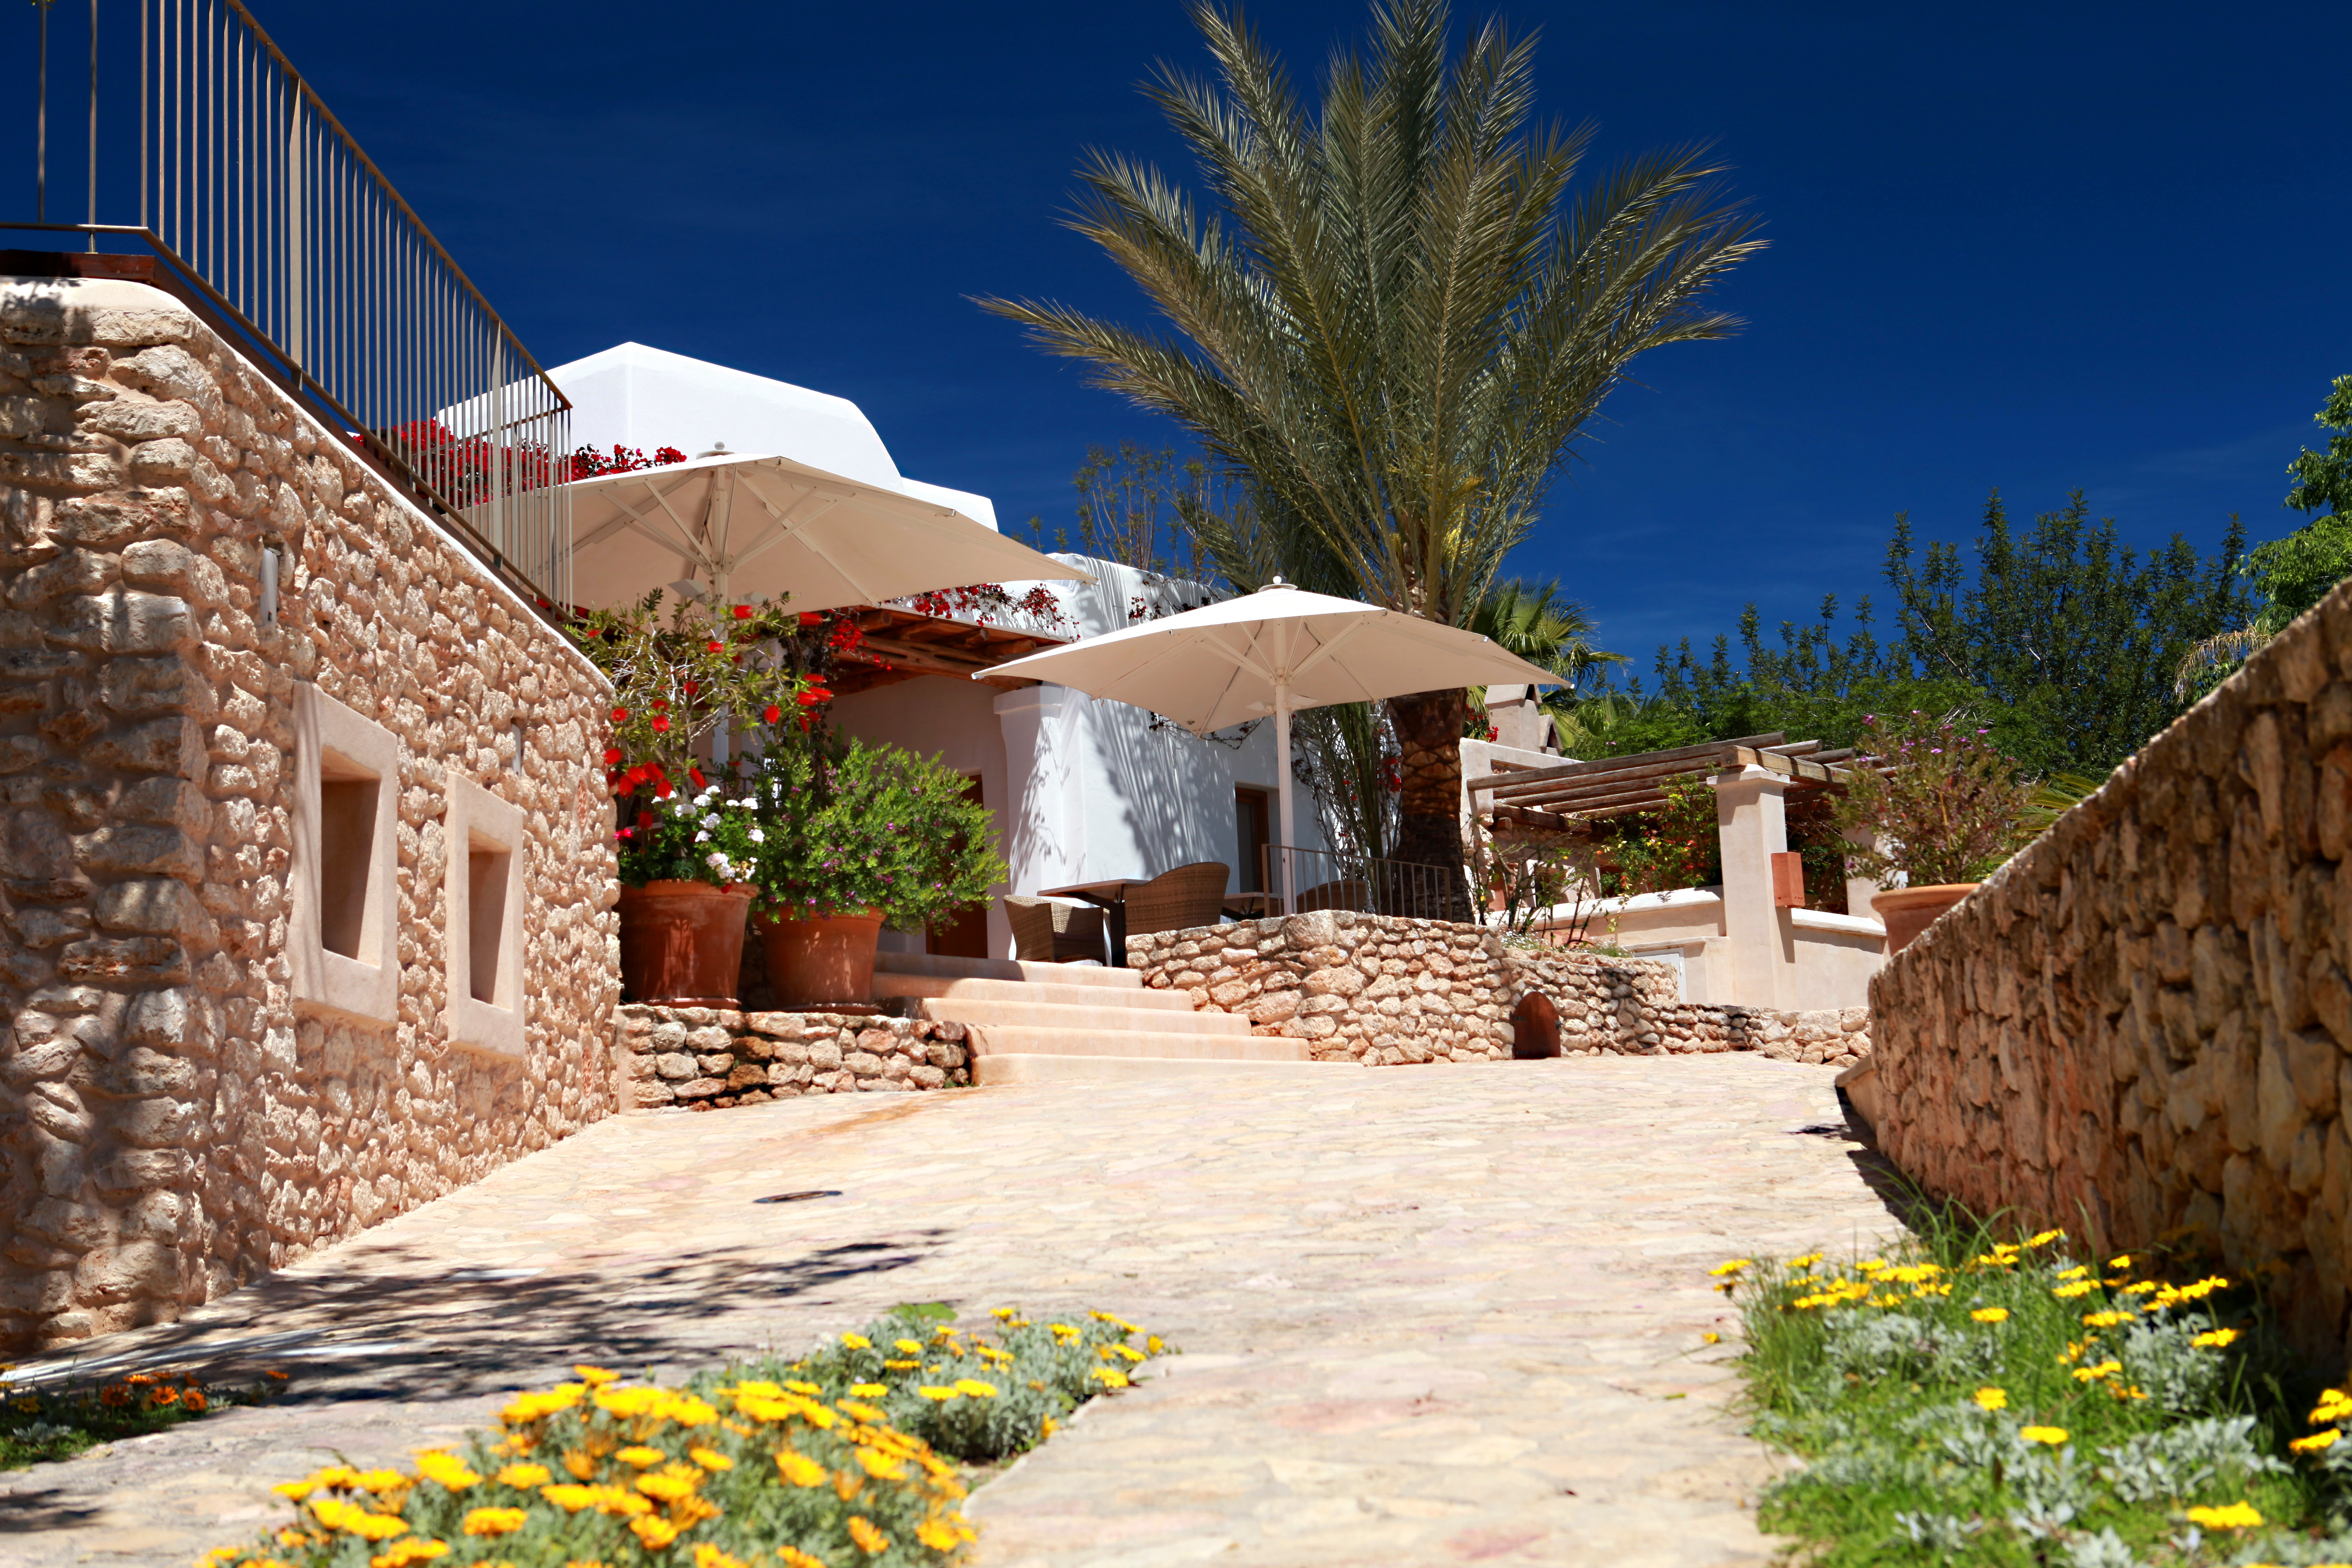 Ibiza holiday villas fabulous luxury villas in the for Ibiza country villas